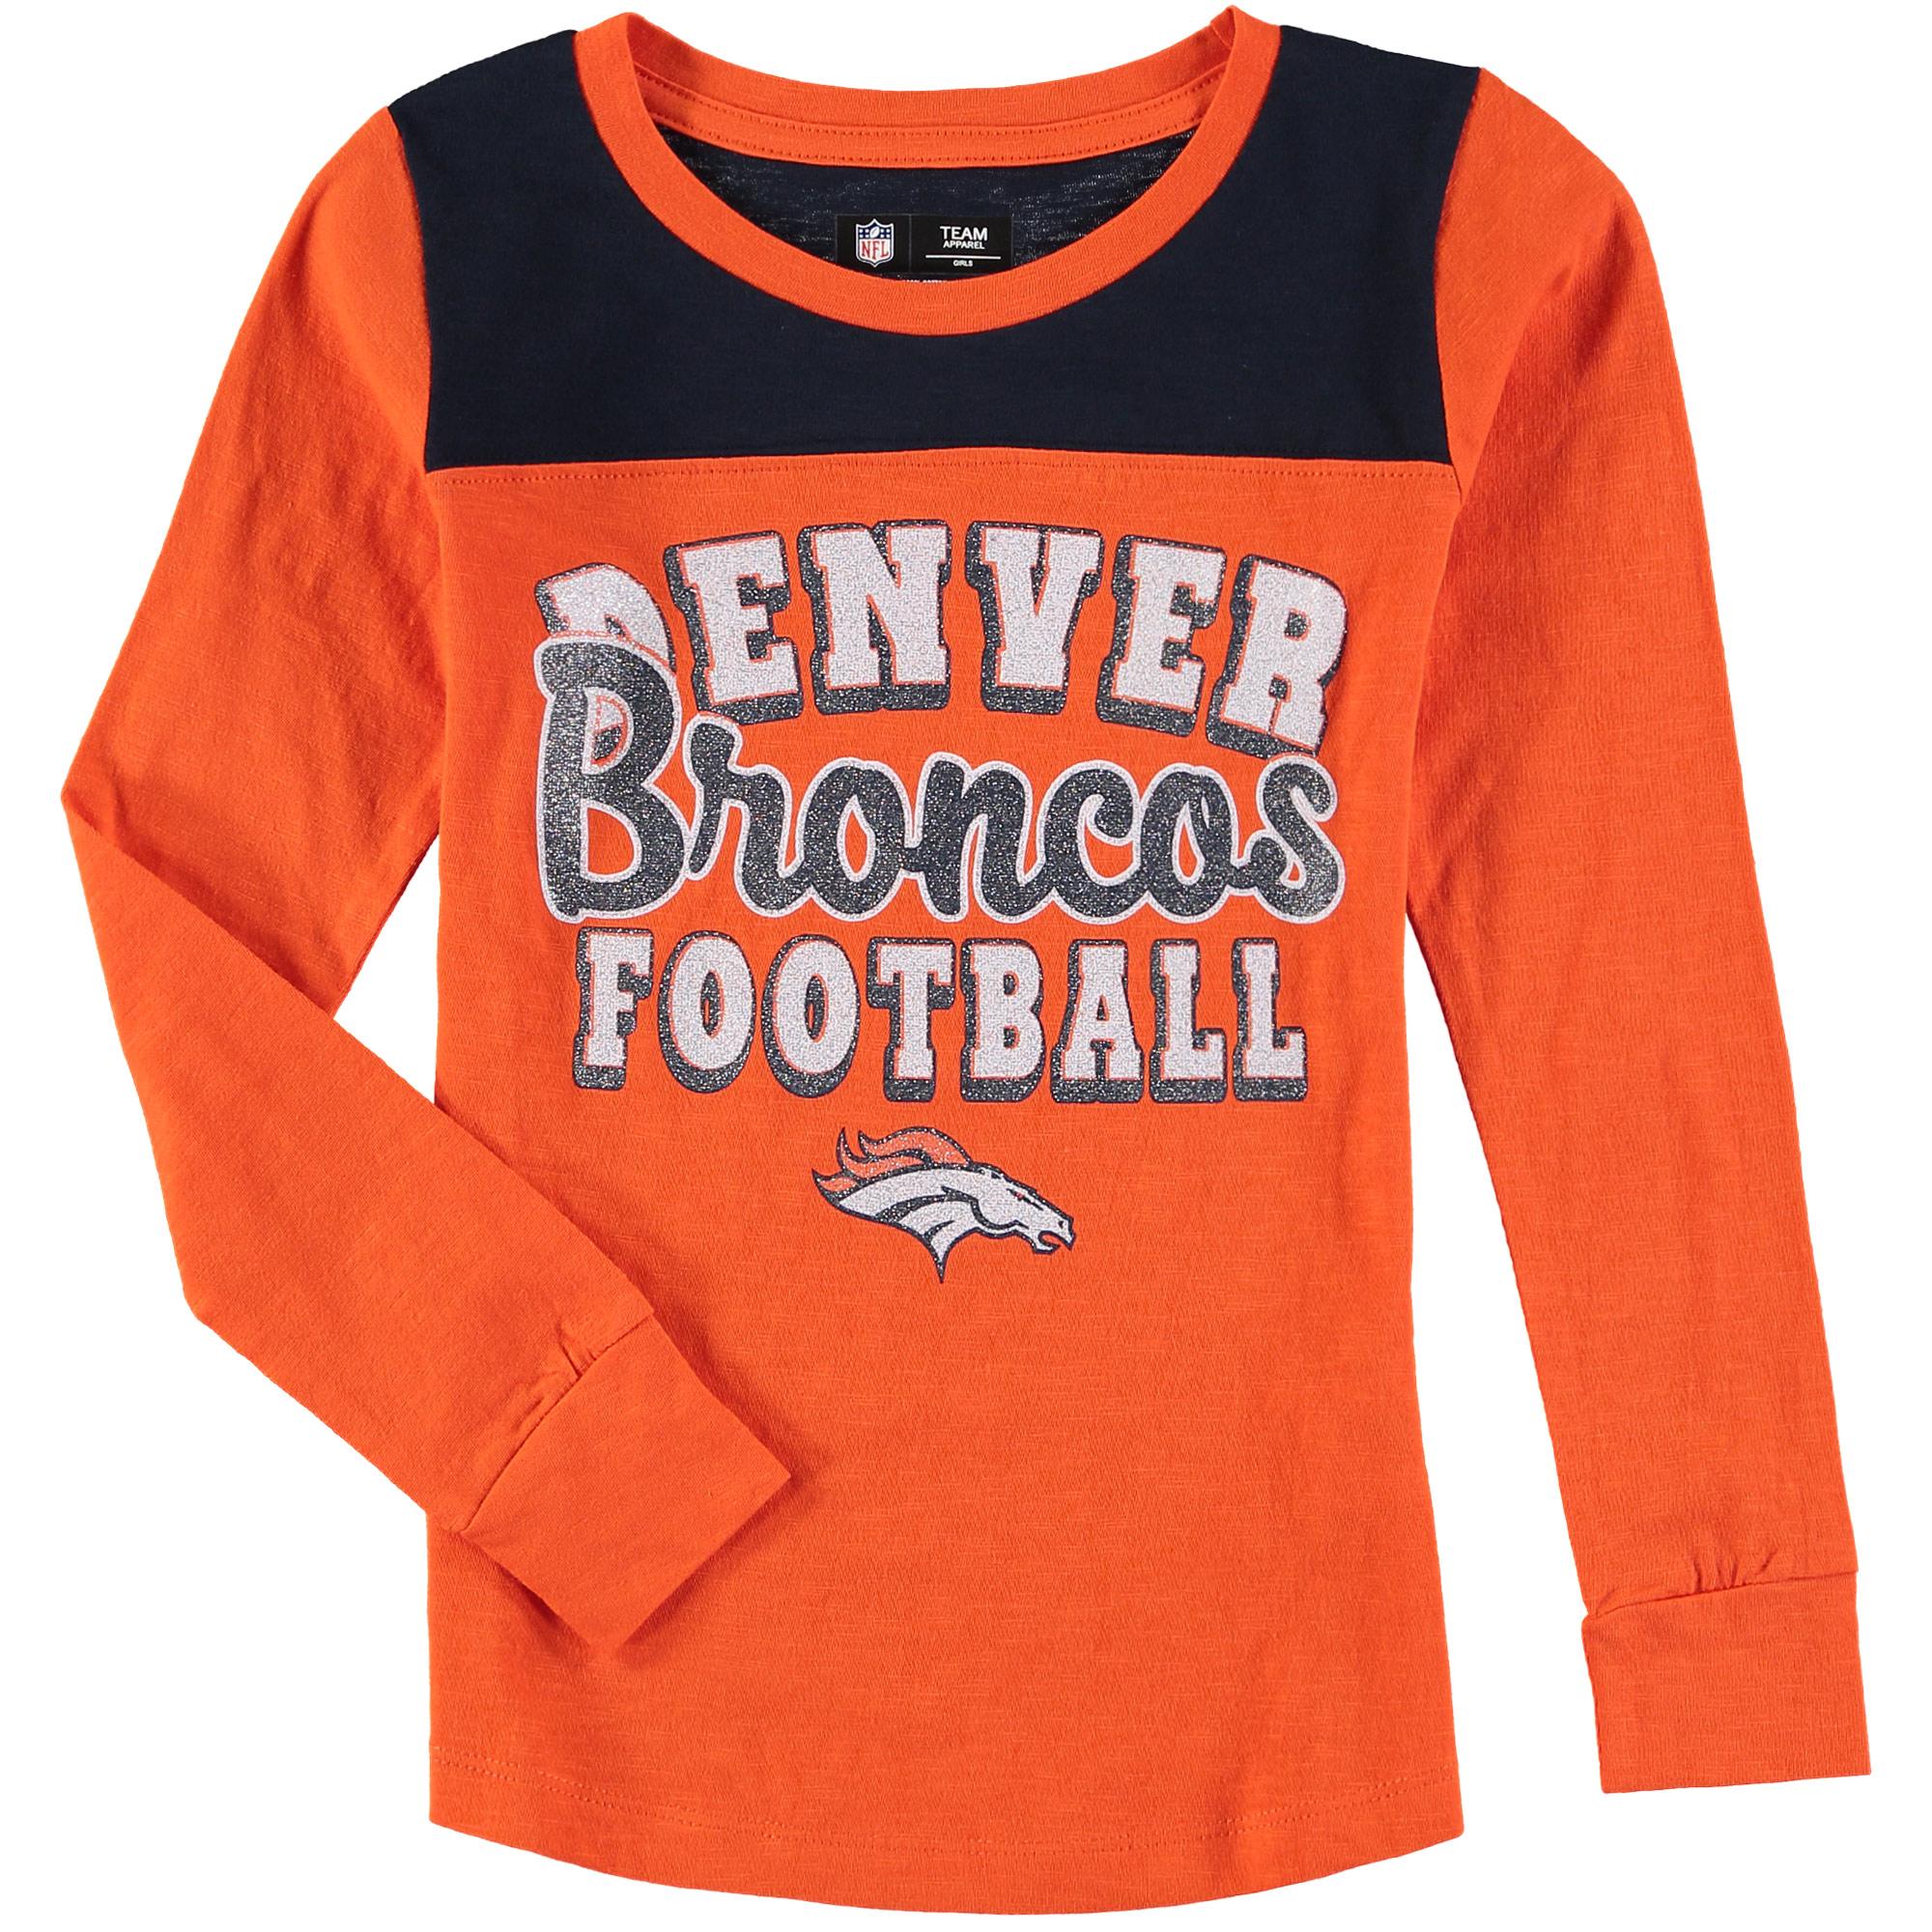 Denver Broncos 5th & Ocean by New Era Girls Youth Glitter Football Long Sleeve T-Shirt - Orange